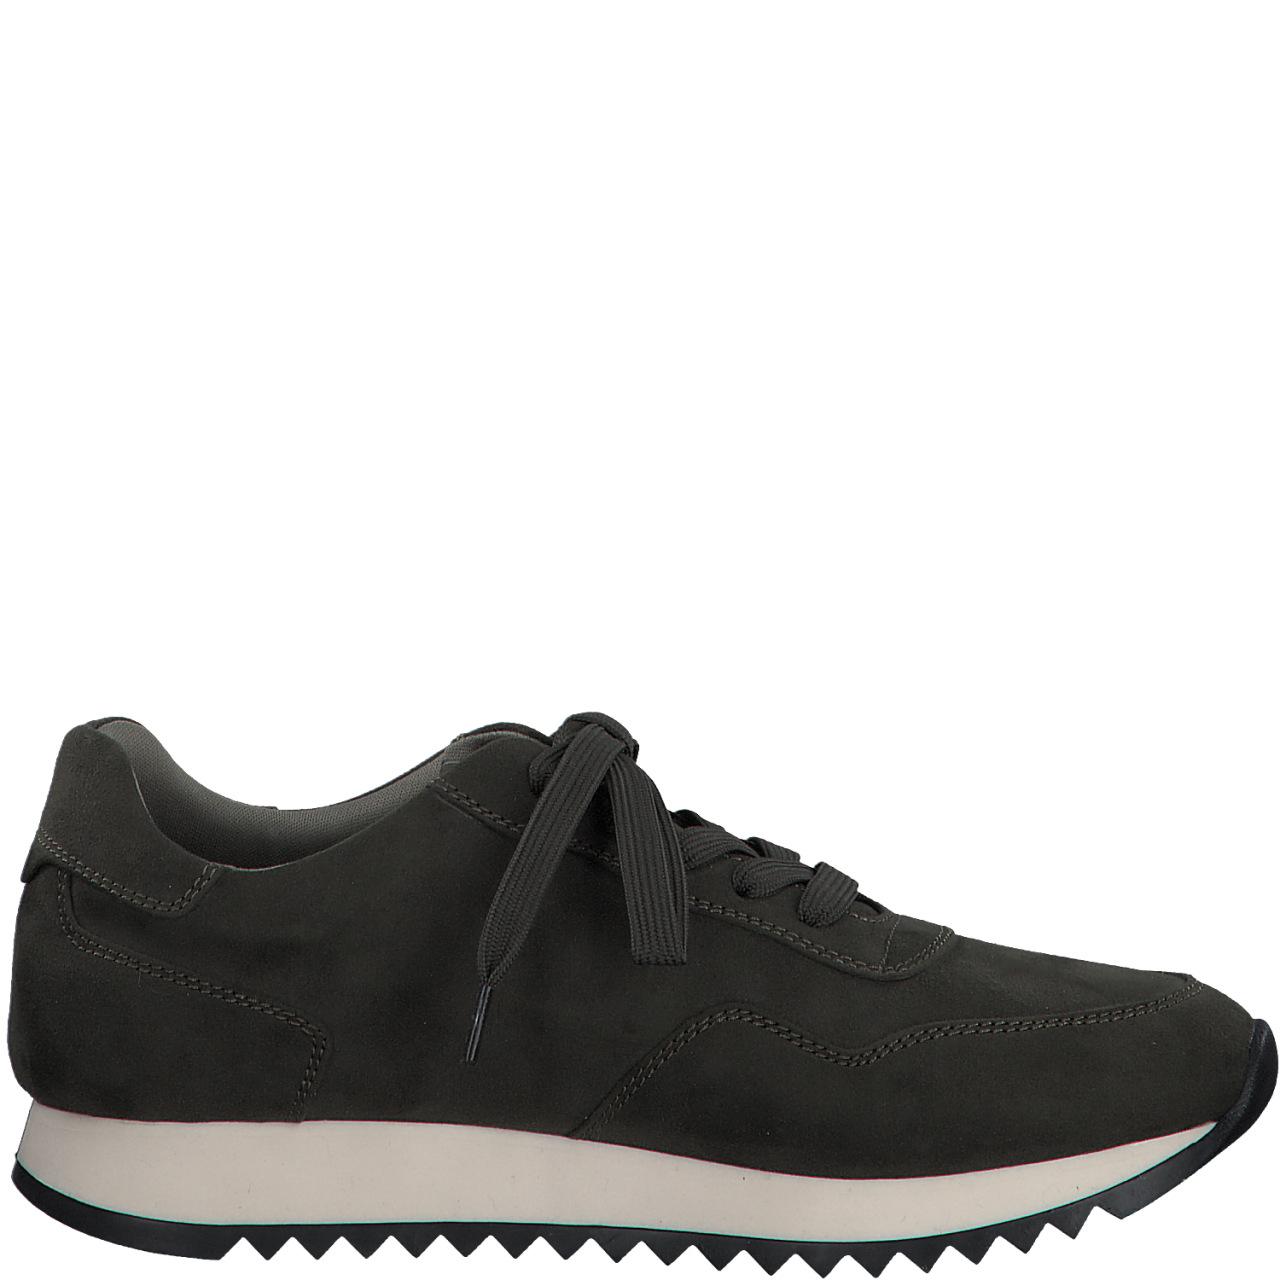 Tarmais 23606 sneakers, olive, 37